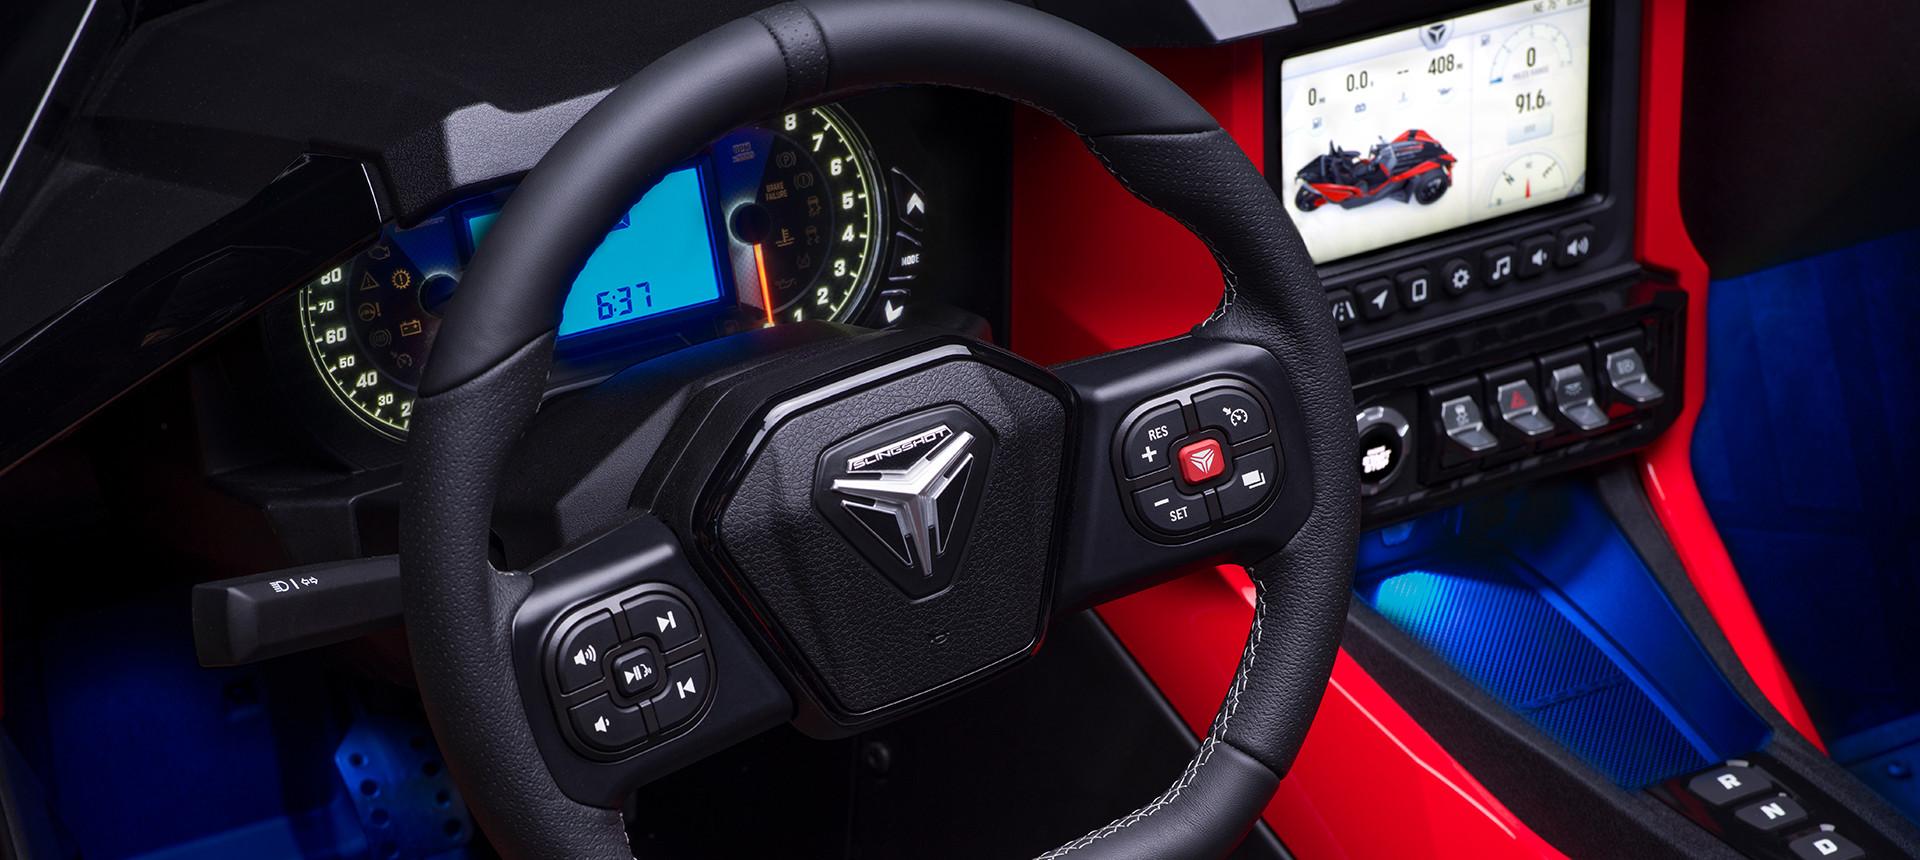 Polaris Slingshot 2020: Новый мотор 203 л.с. и АКПП